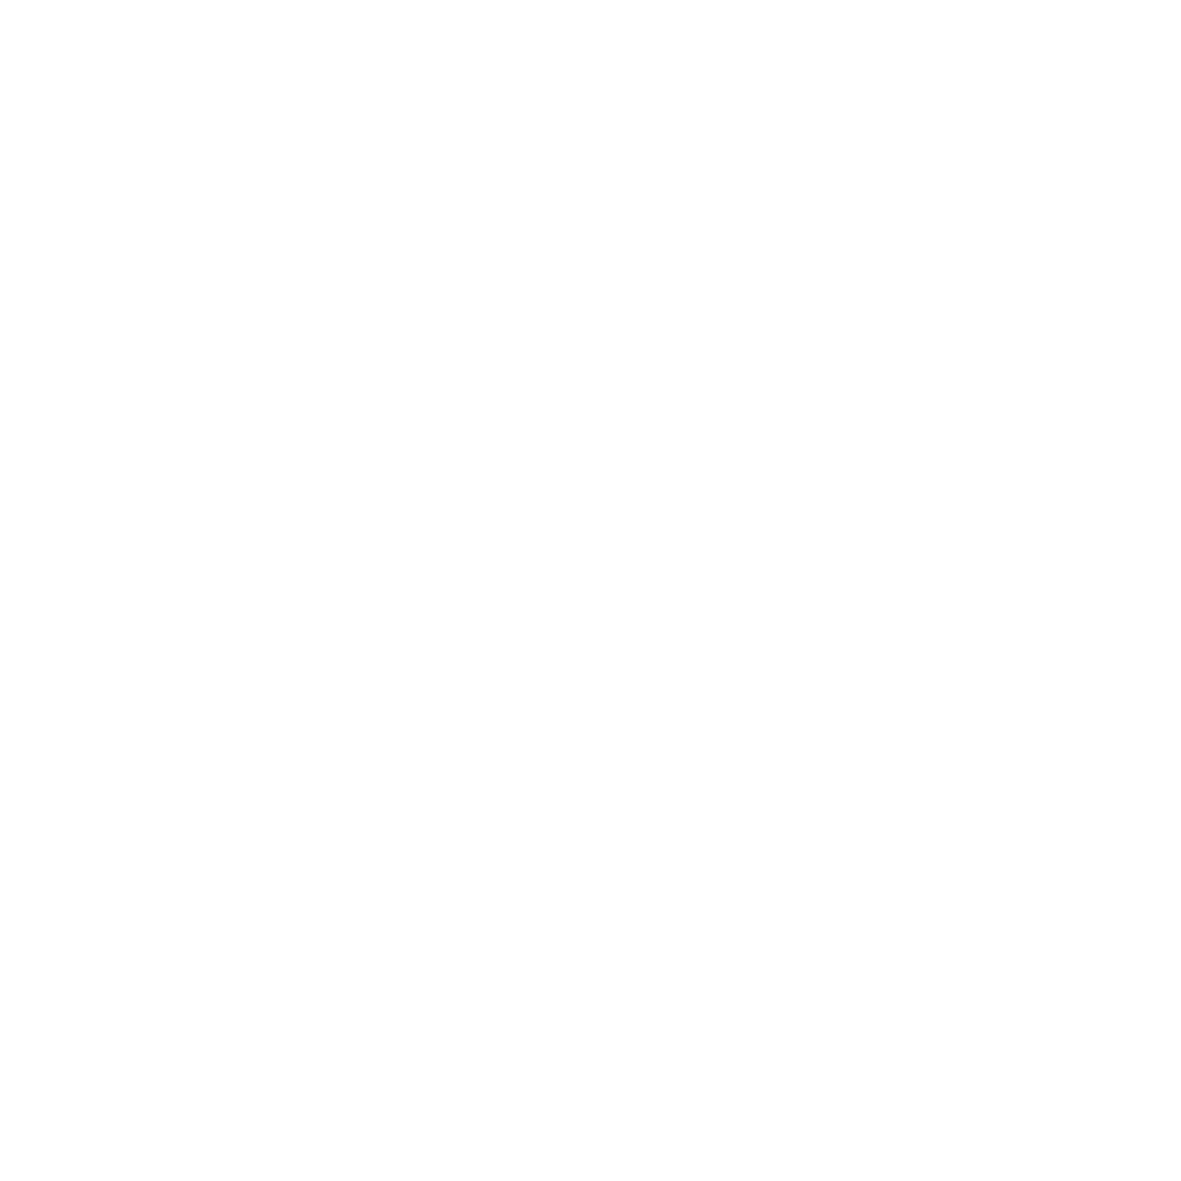 grafismo_3